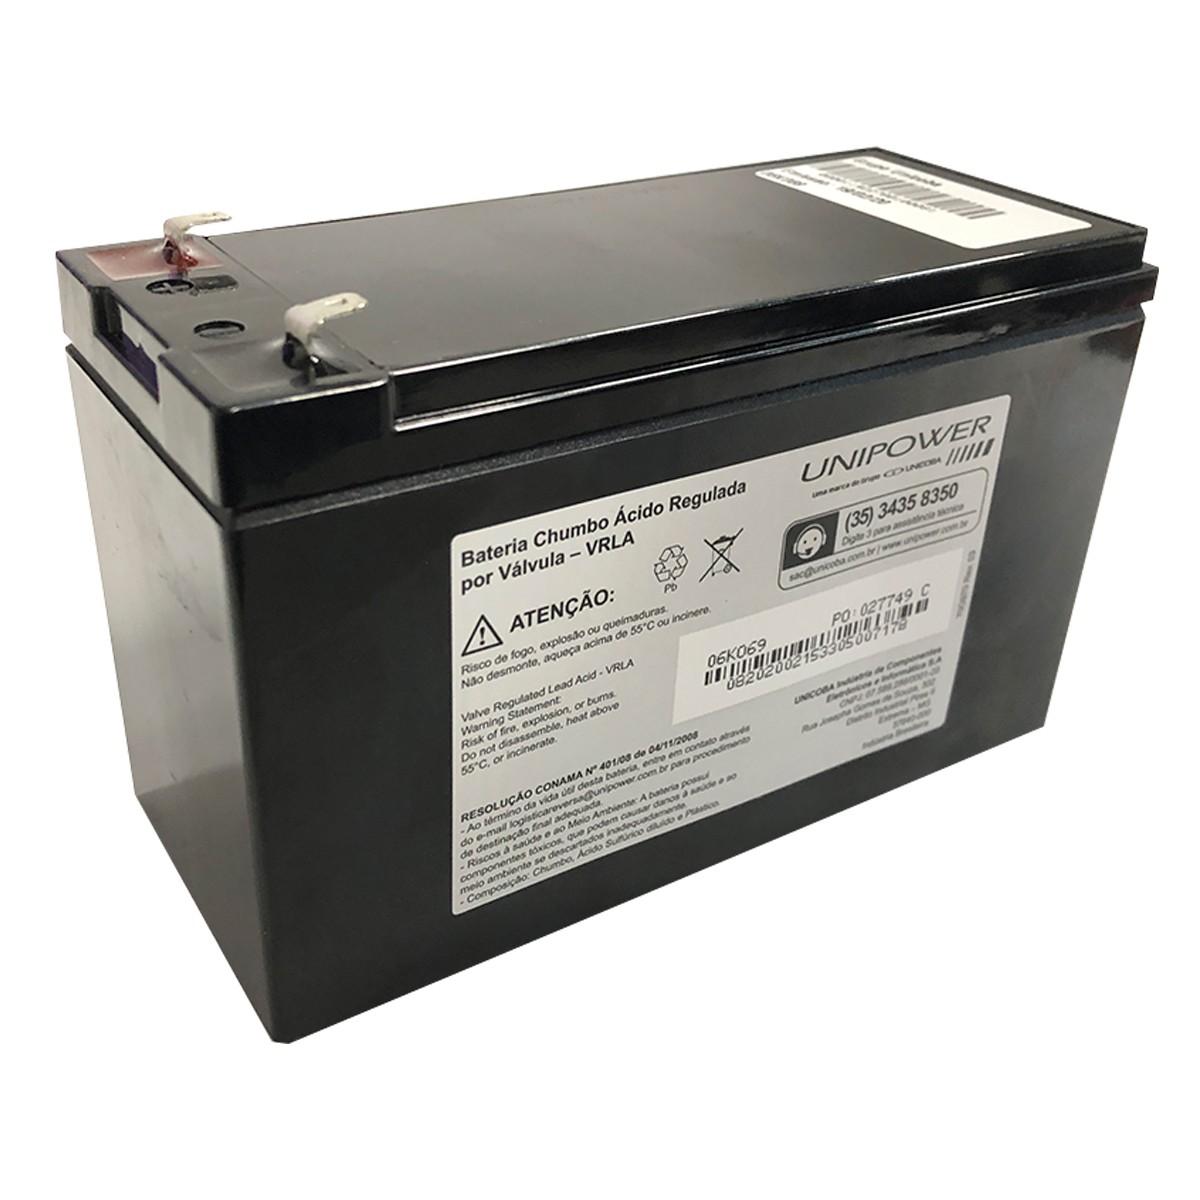 Bateria Unipower para Segurança/Nobreak UP1270SEG 12V 7.0Ah